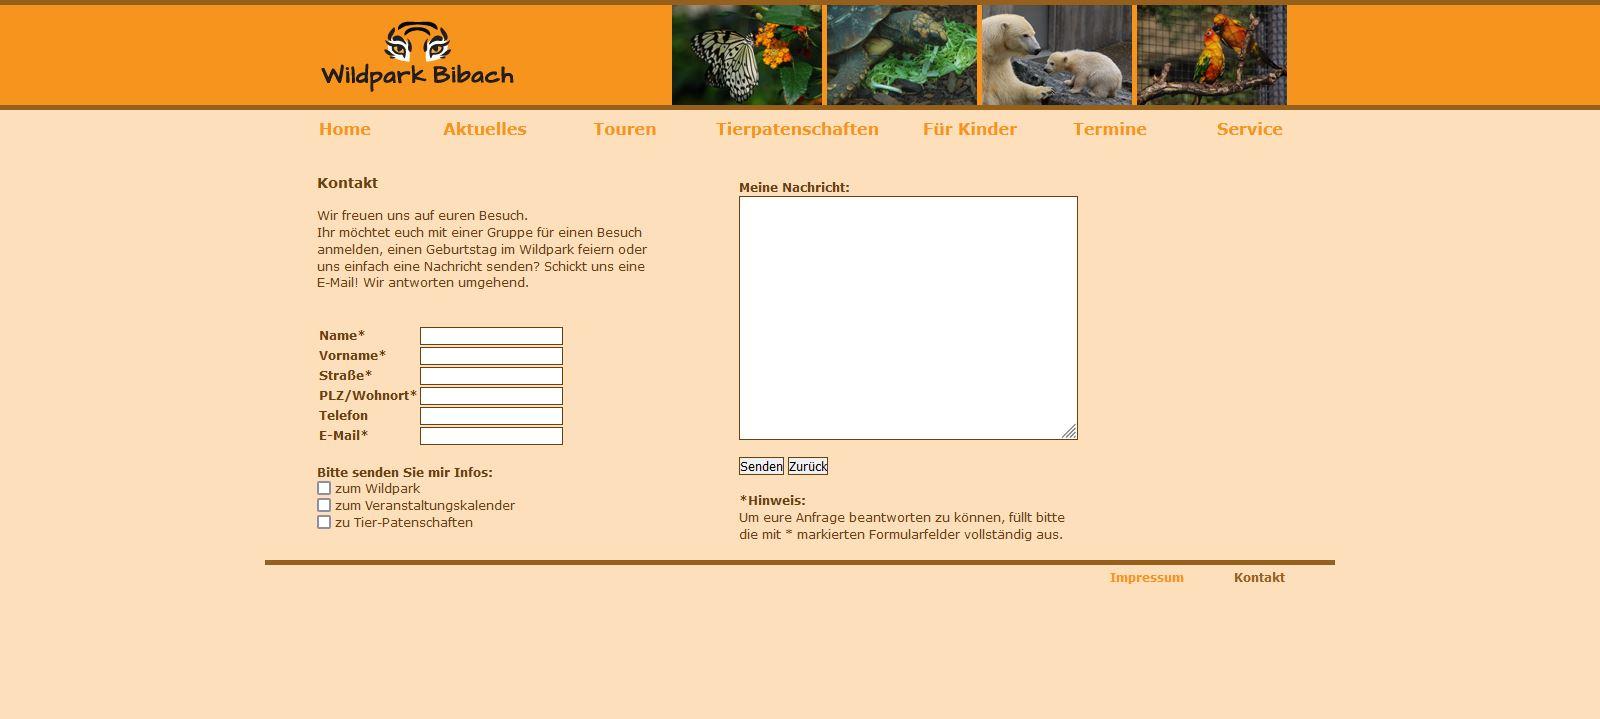 Wildpark Bibach - Kontakt